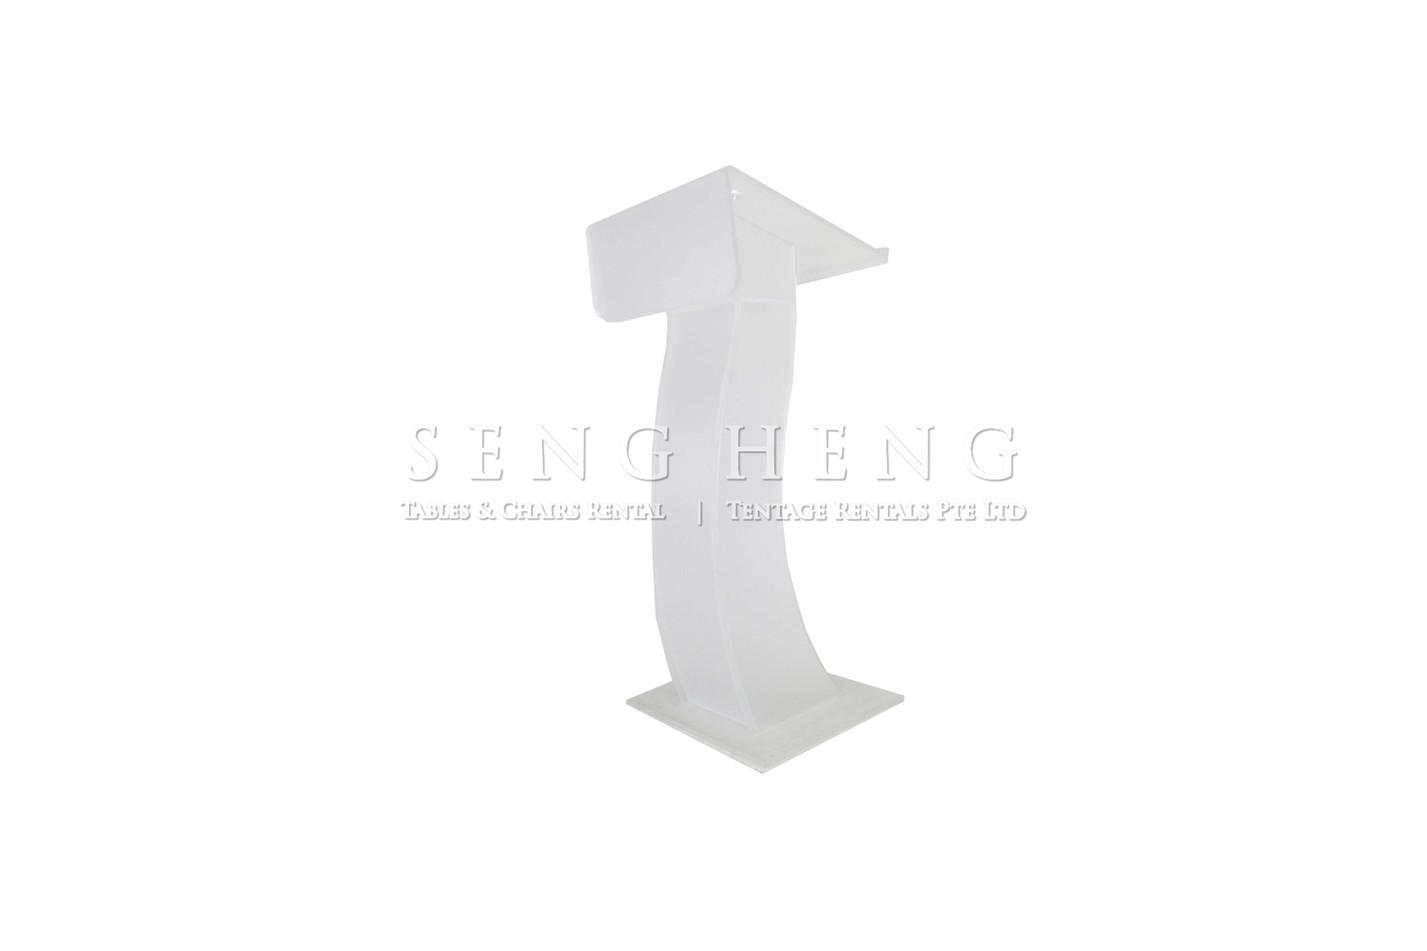 Type B: Transparent Acrylic